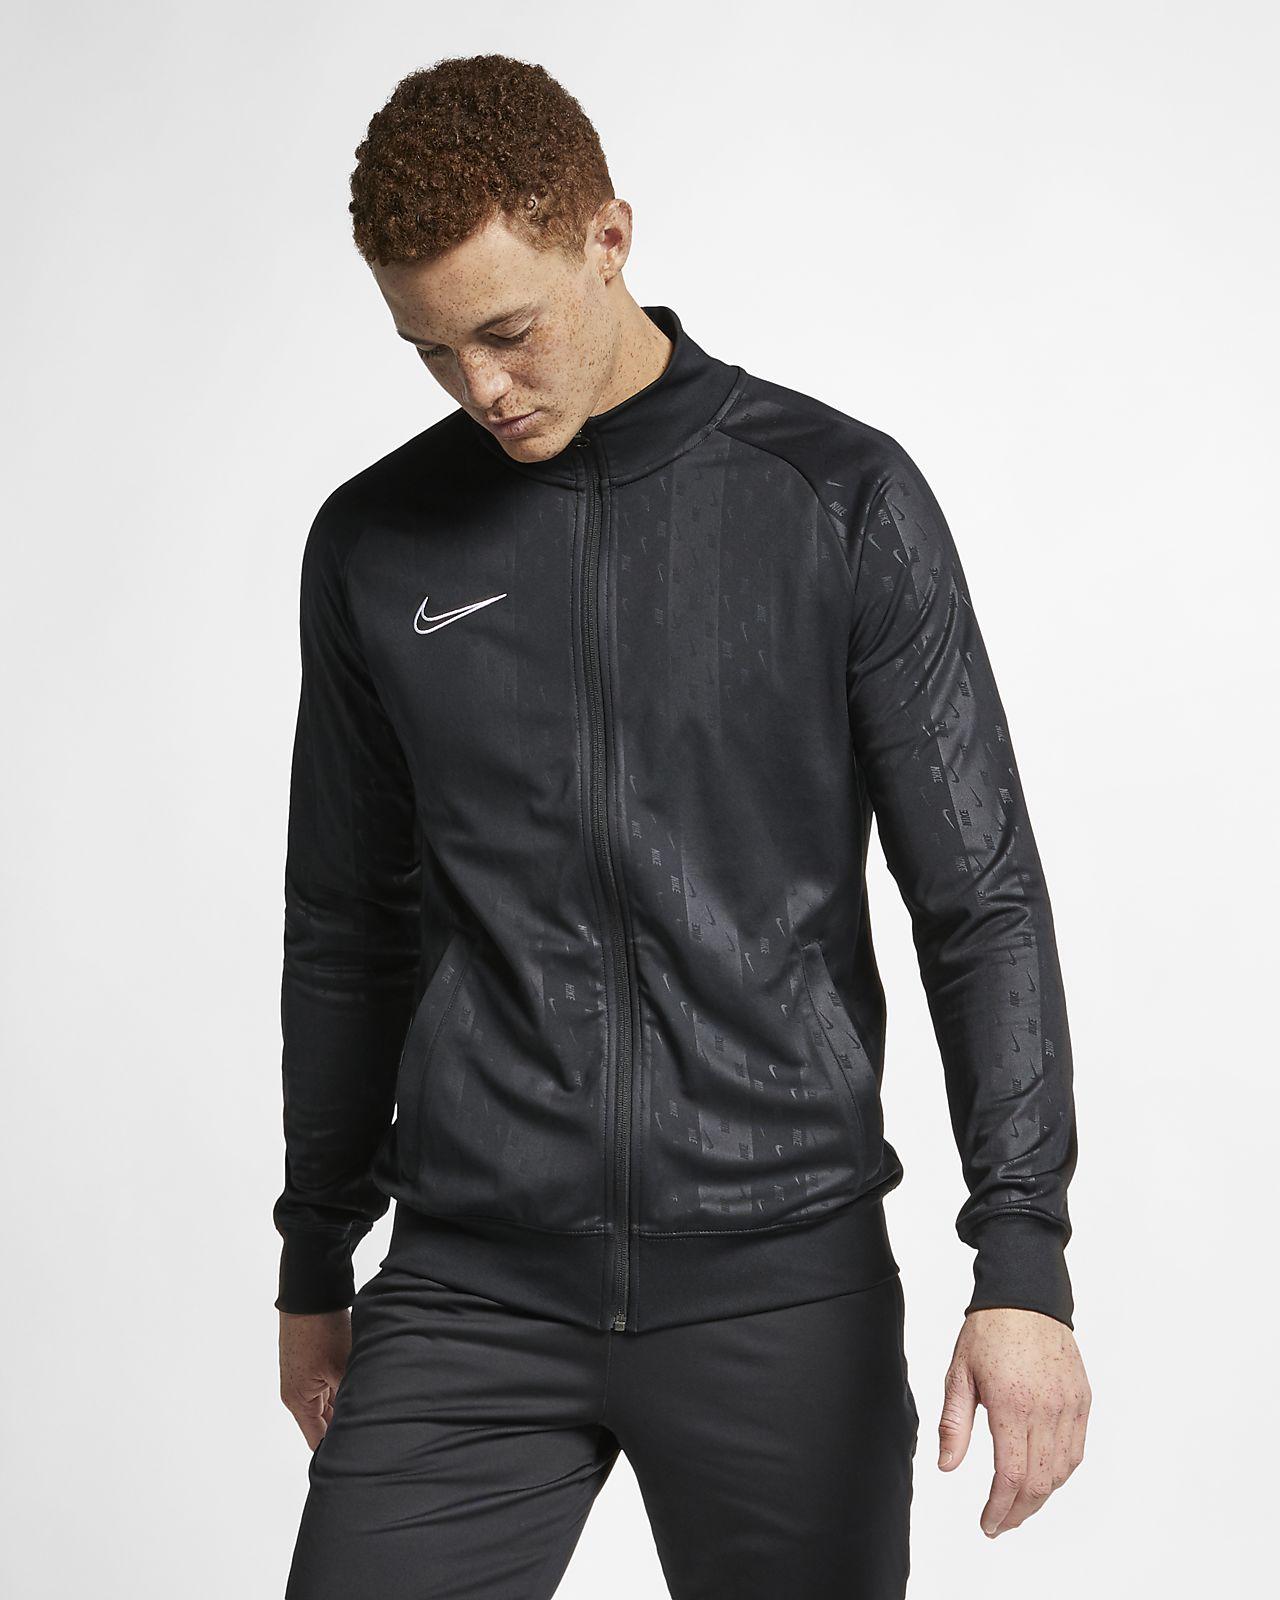 c3c241b6 Nike Dri-FIT Academy Men's Soccer Jacket. Nike.com